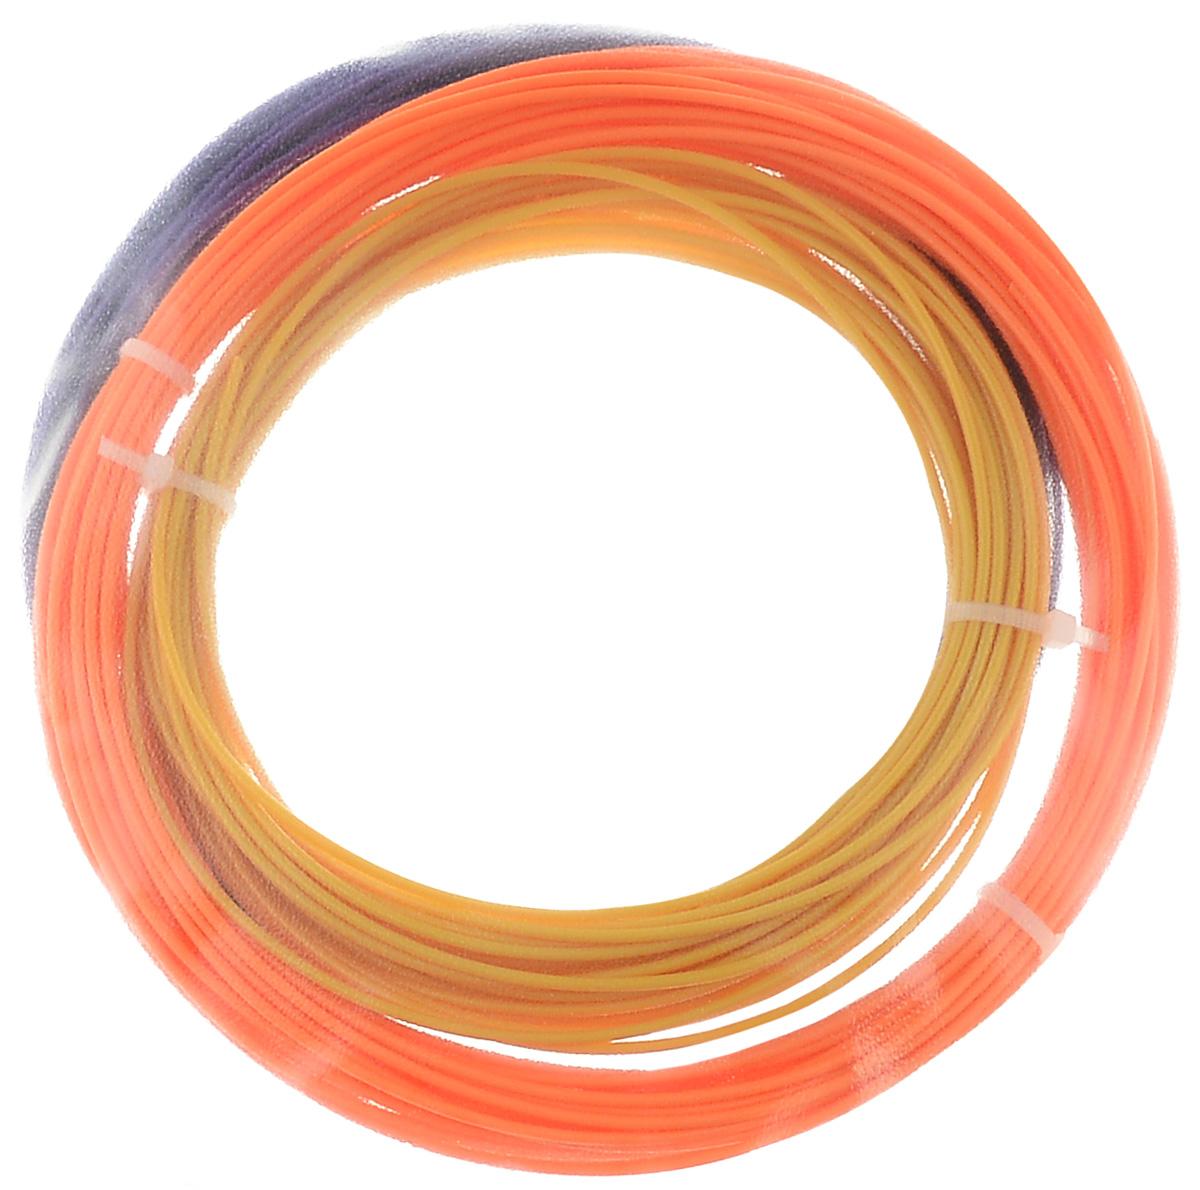 ESUN 3D Filament, Orange Gold Purple комплект ABS-пластика, 10 м creopop ink 3d printer pen plastic pla filament set petg rods moscow cheap russia delivery temperature purple pink orange